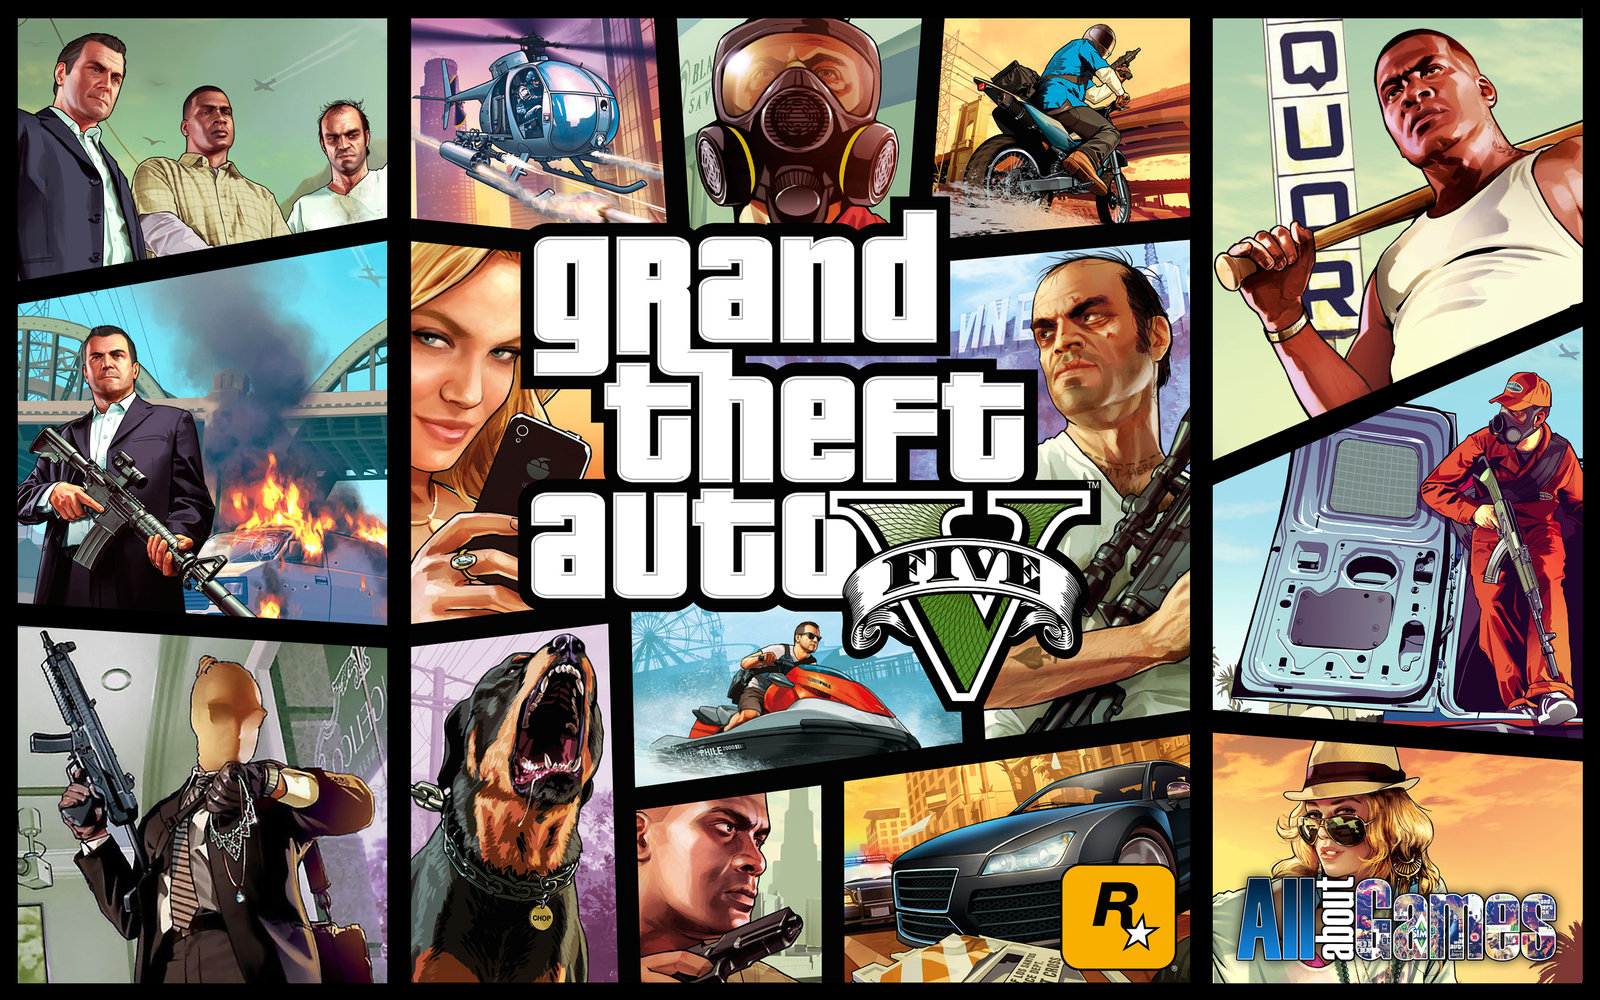 Grand Theft Auto V Wallpaper by eduard2009 1600x1000